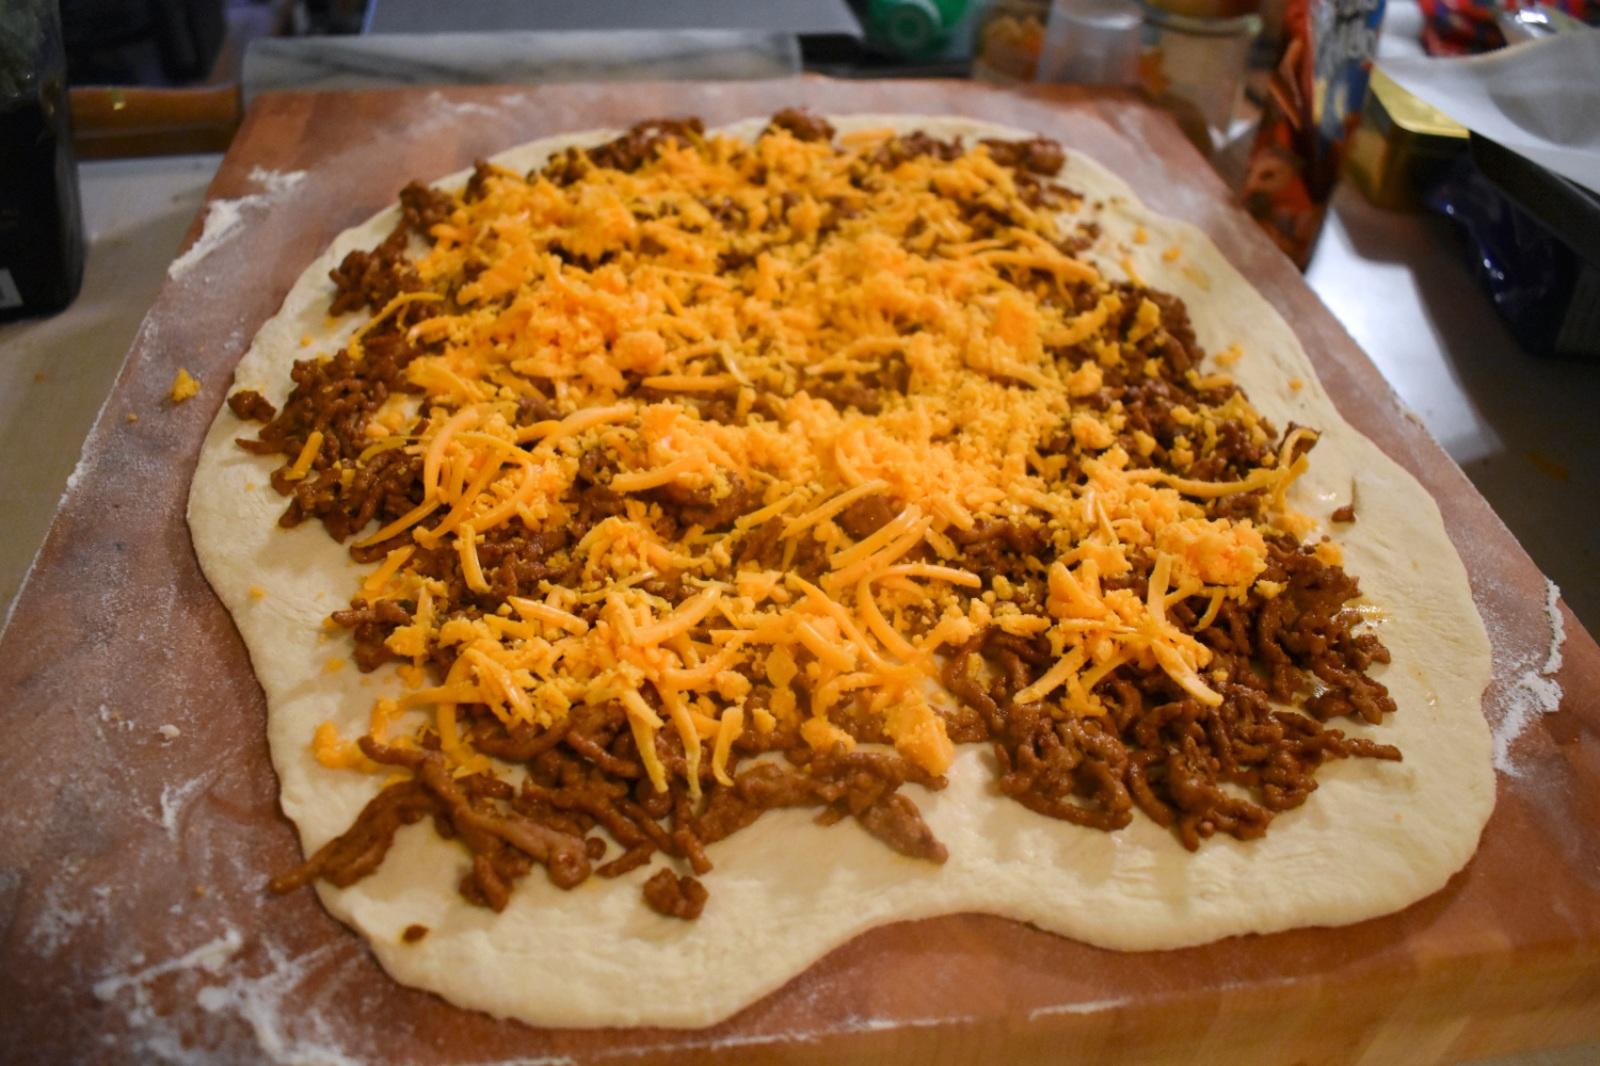 Roulés de tacos - Auboutdelalangue.com (3)